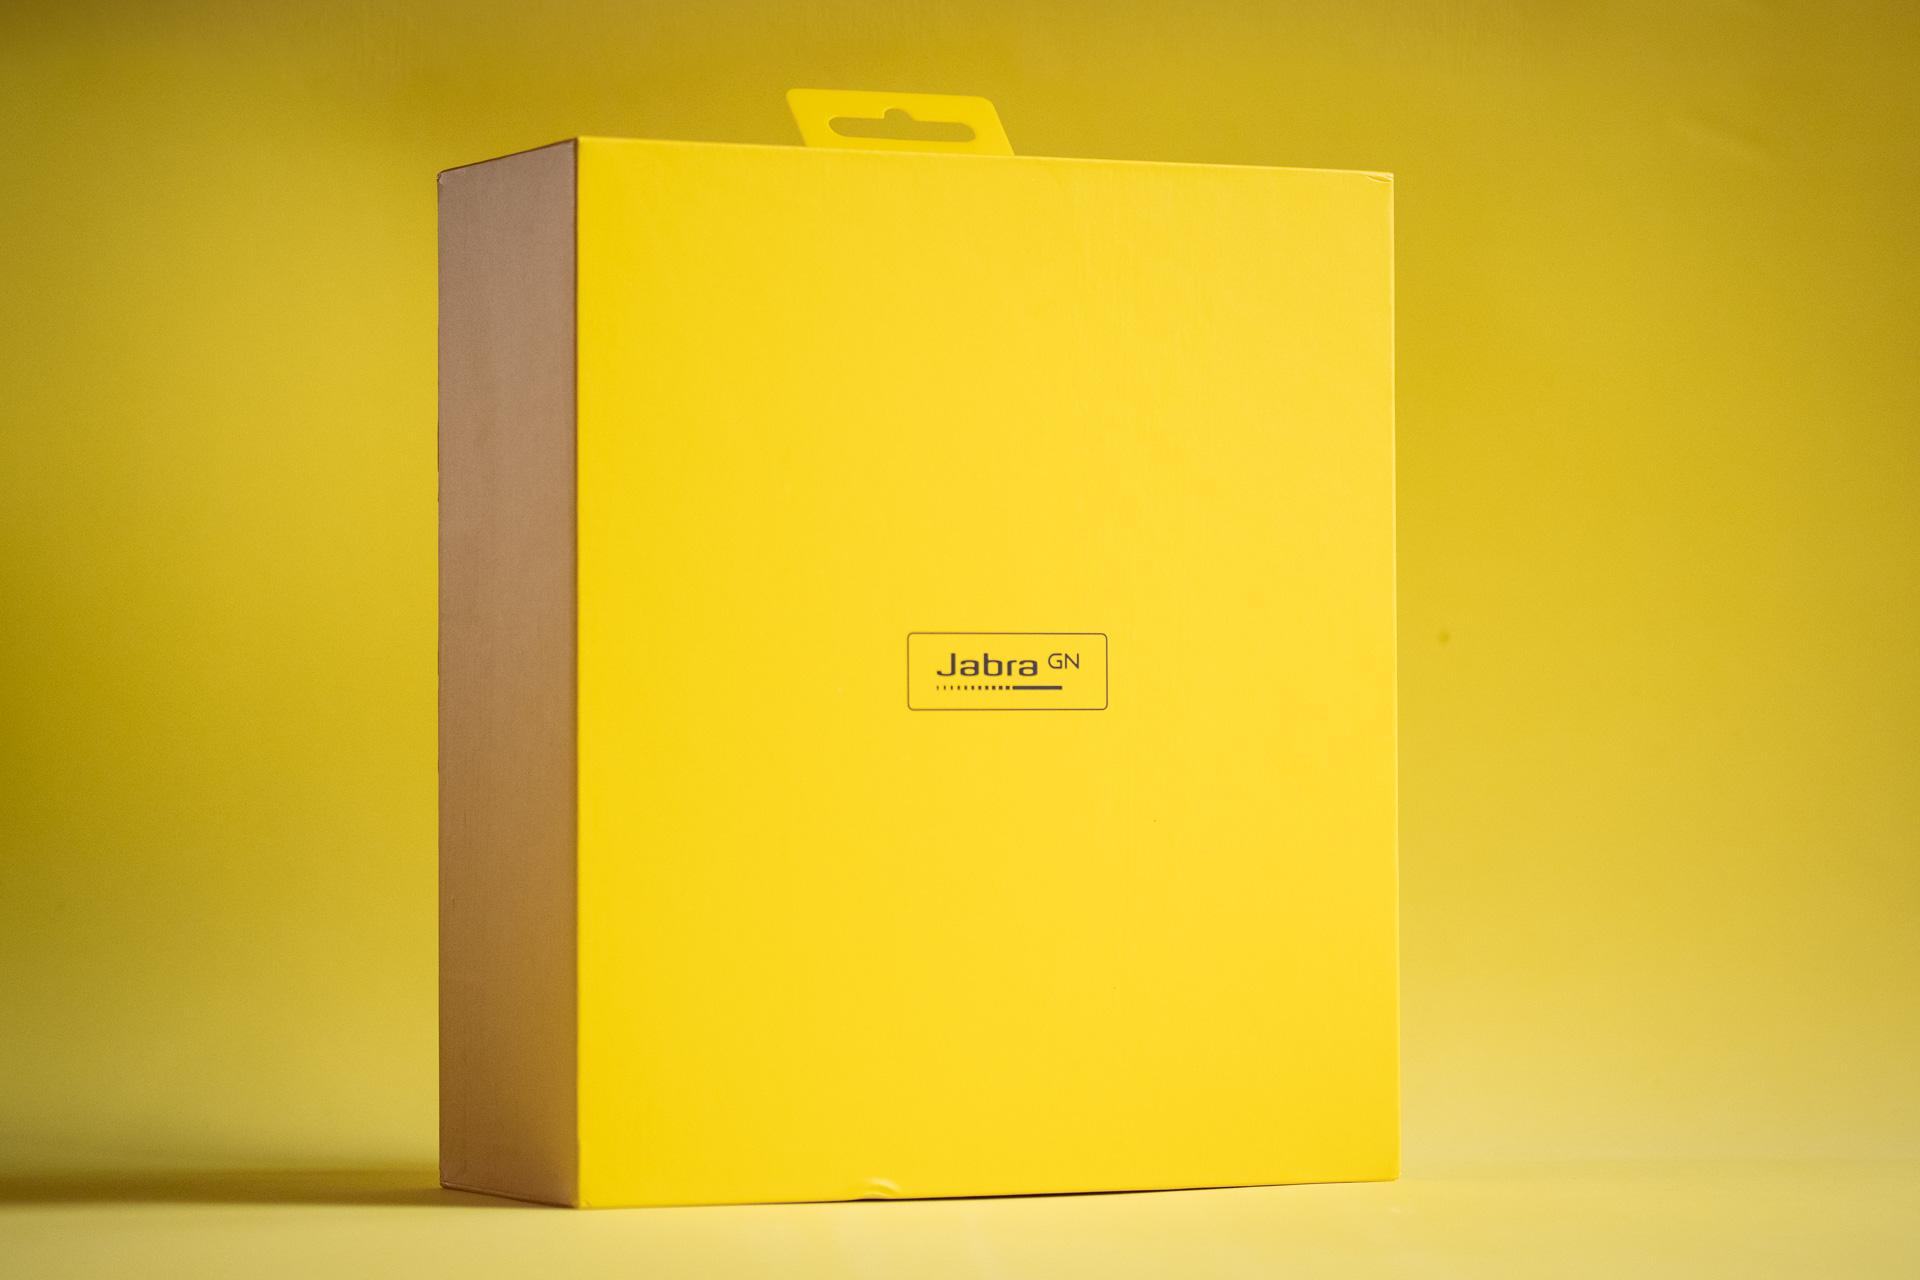 BPP 09 - Jabra Elite 85h Packaging IG-5.jpg